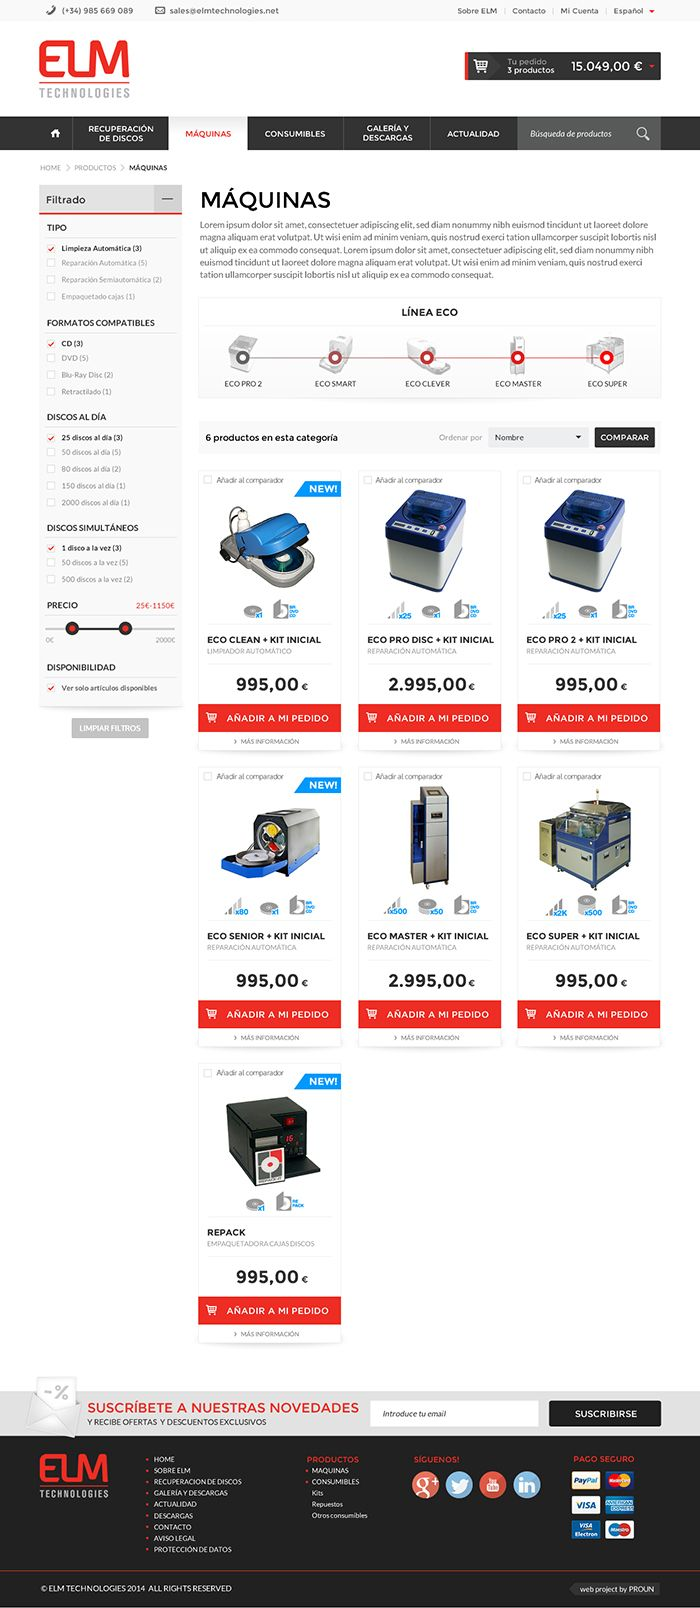 Diseño web de la tienda online de ELM TECHNOLOGIES.